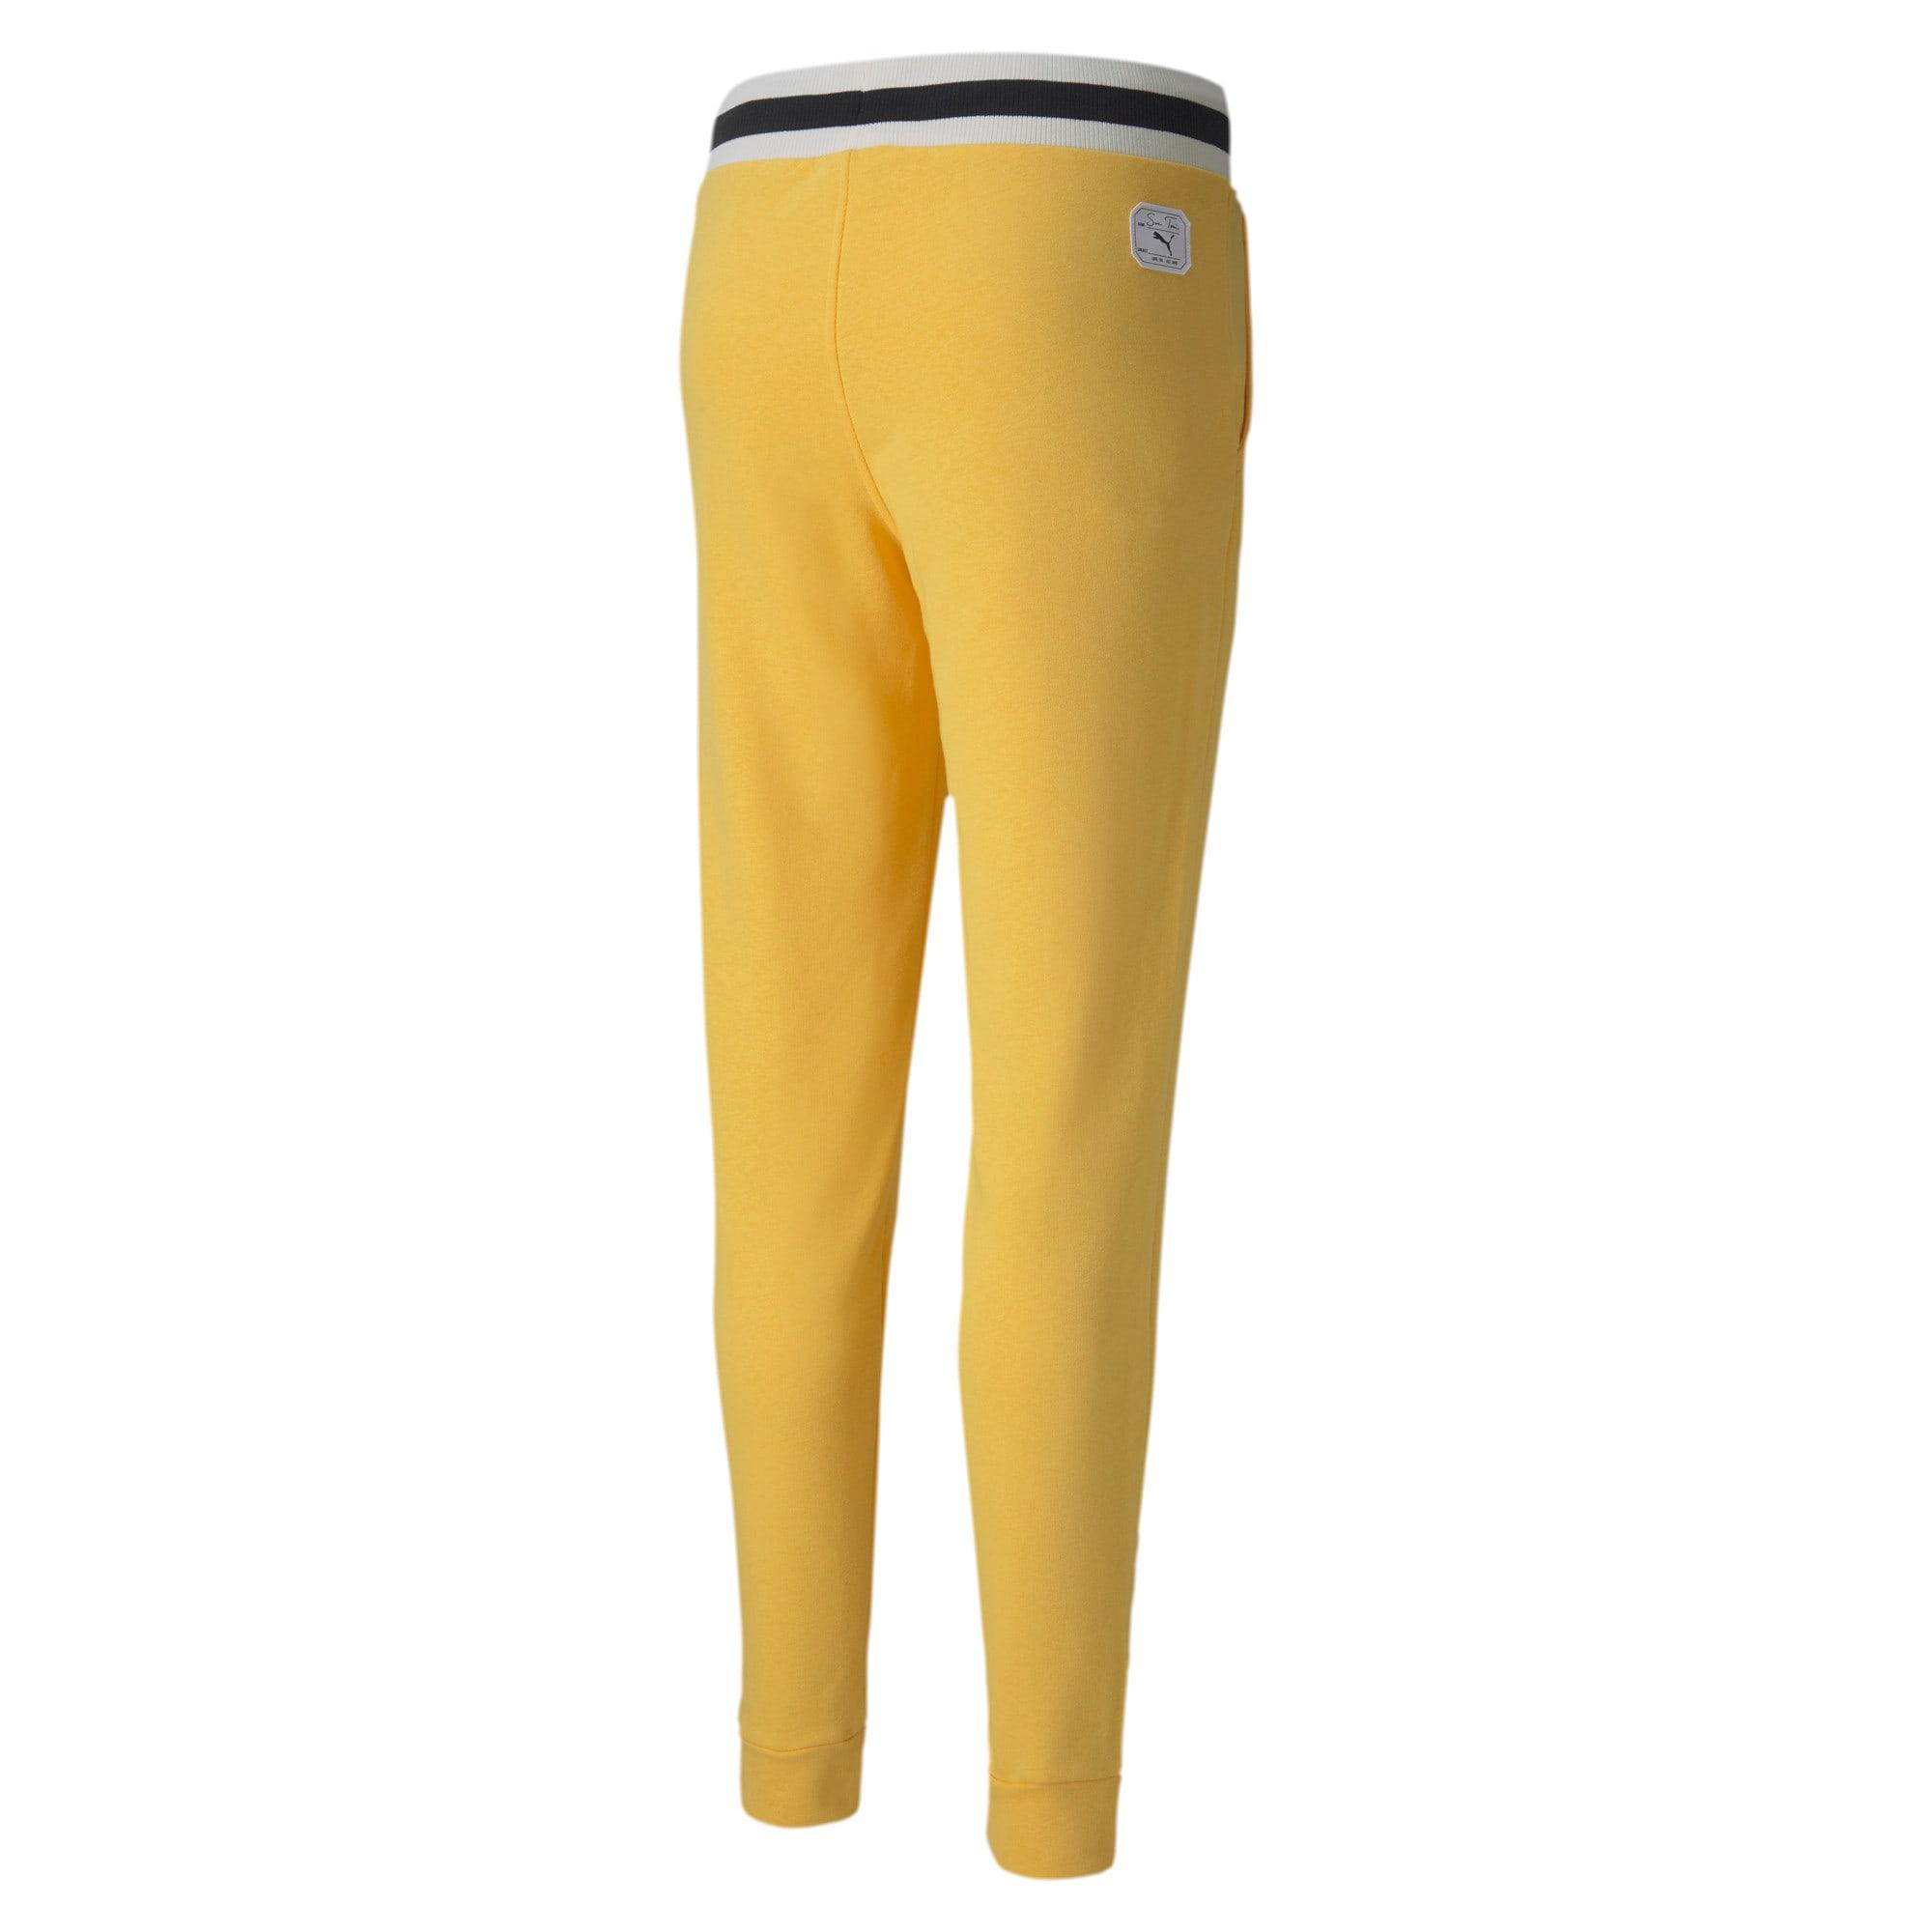 Thumbnail 2 of PUMA x SUE TSAI sweatpants voor dames, Daffodil, medium